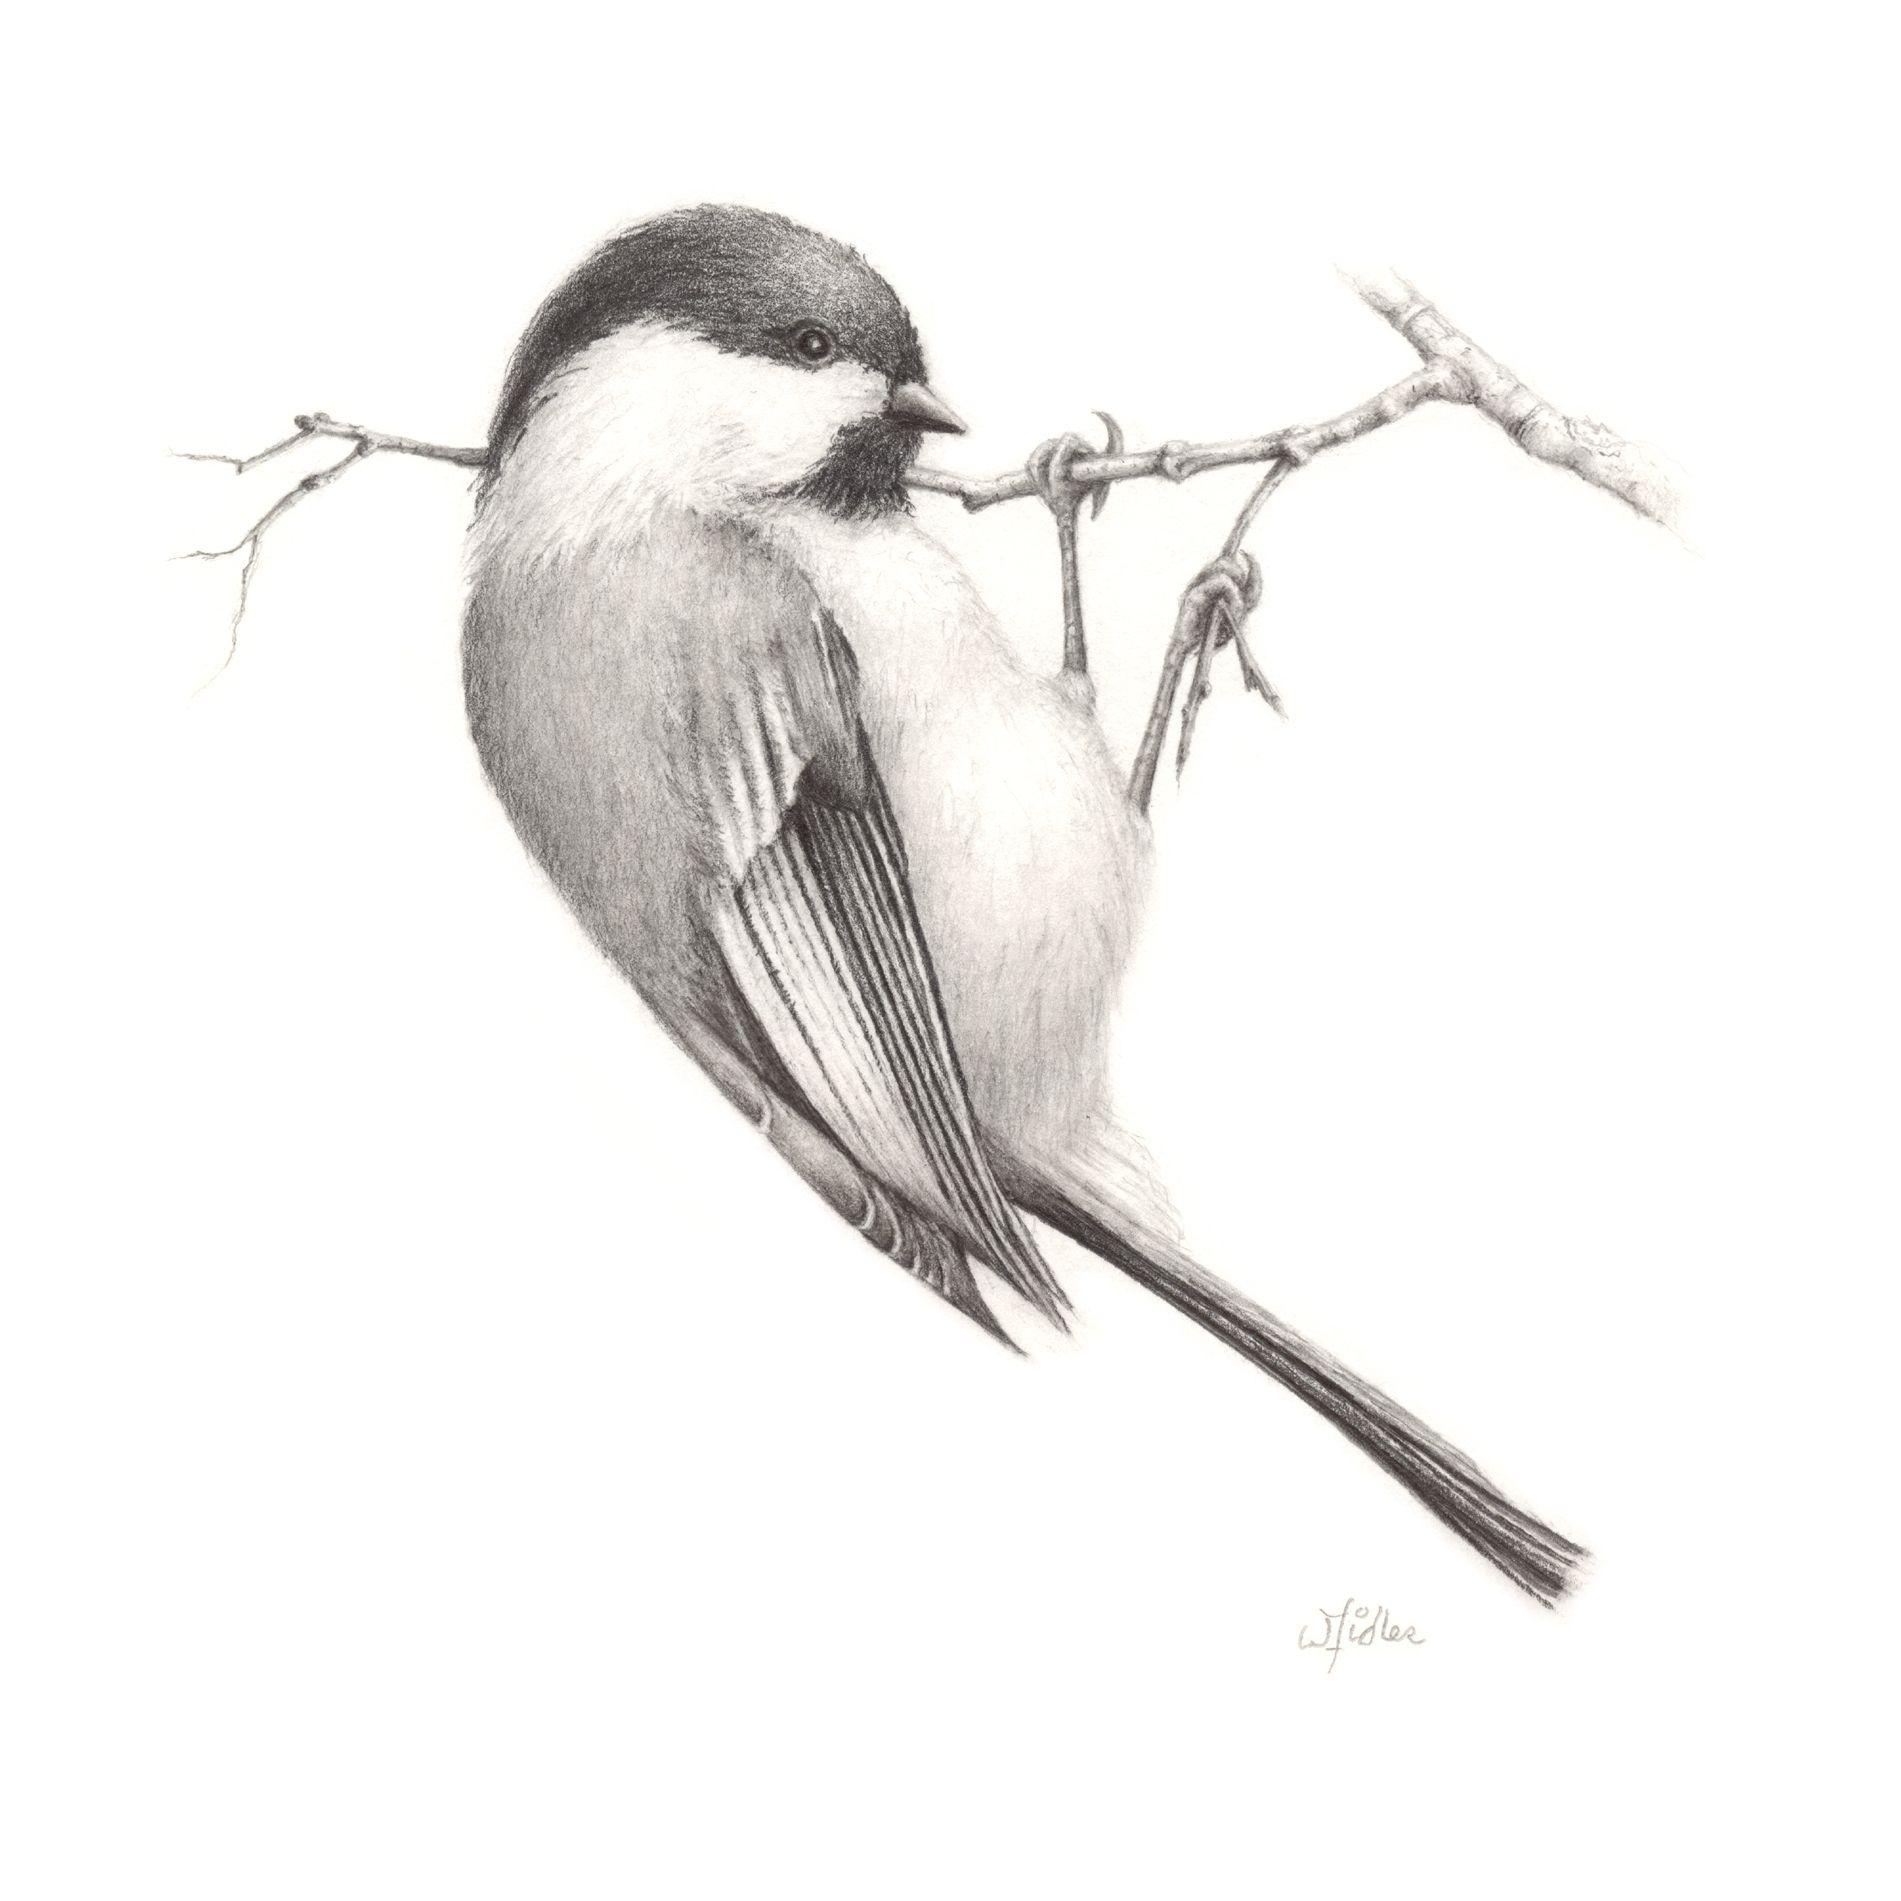 chickadee drawing - Google Search   Bird pencil drawing ... - photo#26